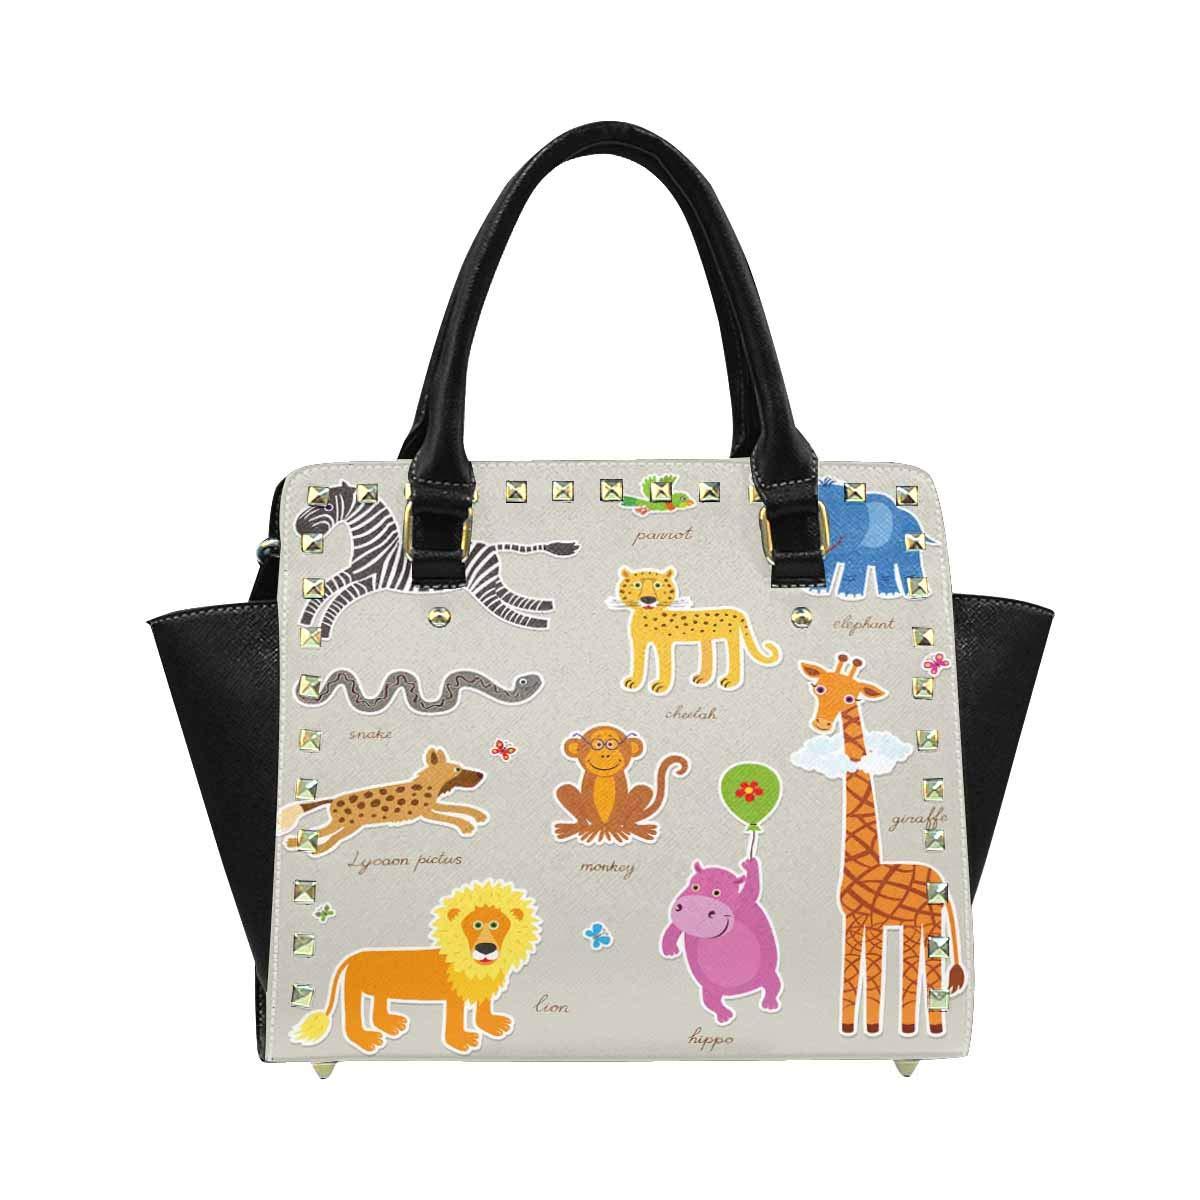 InterestPrint Womens Africa Kids Seamless Pattern Funny Cartoon Crocodile Rivet Shoulder Handbag Shoulder Bags